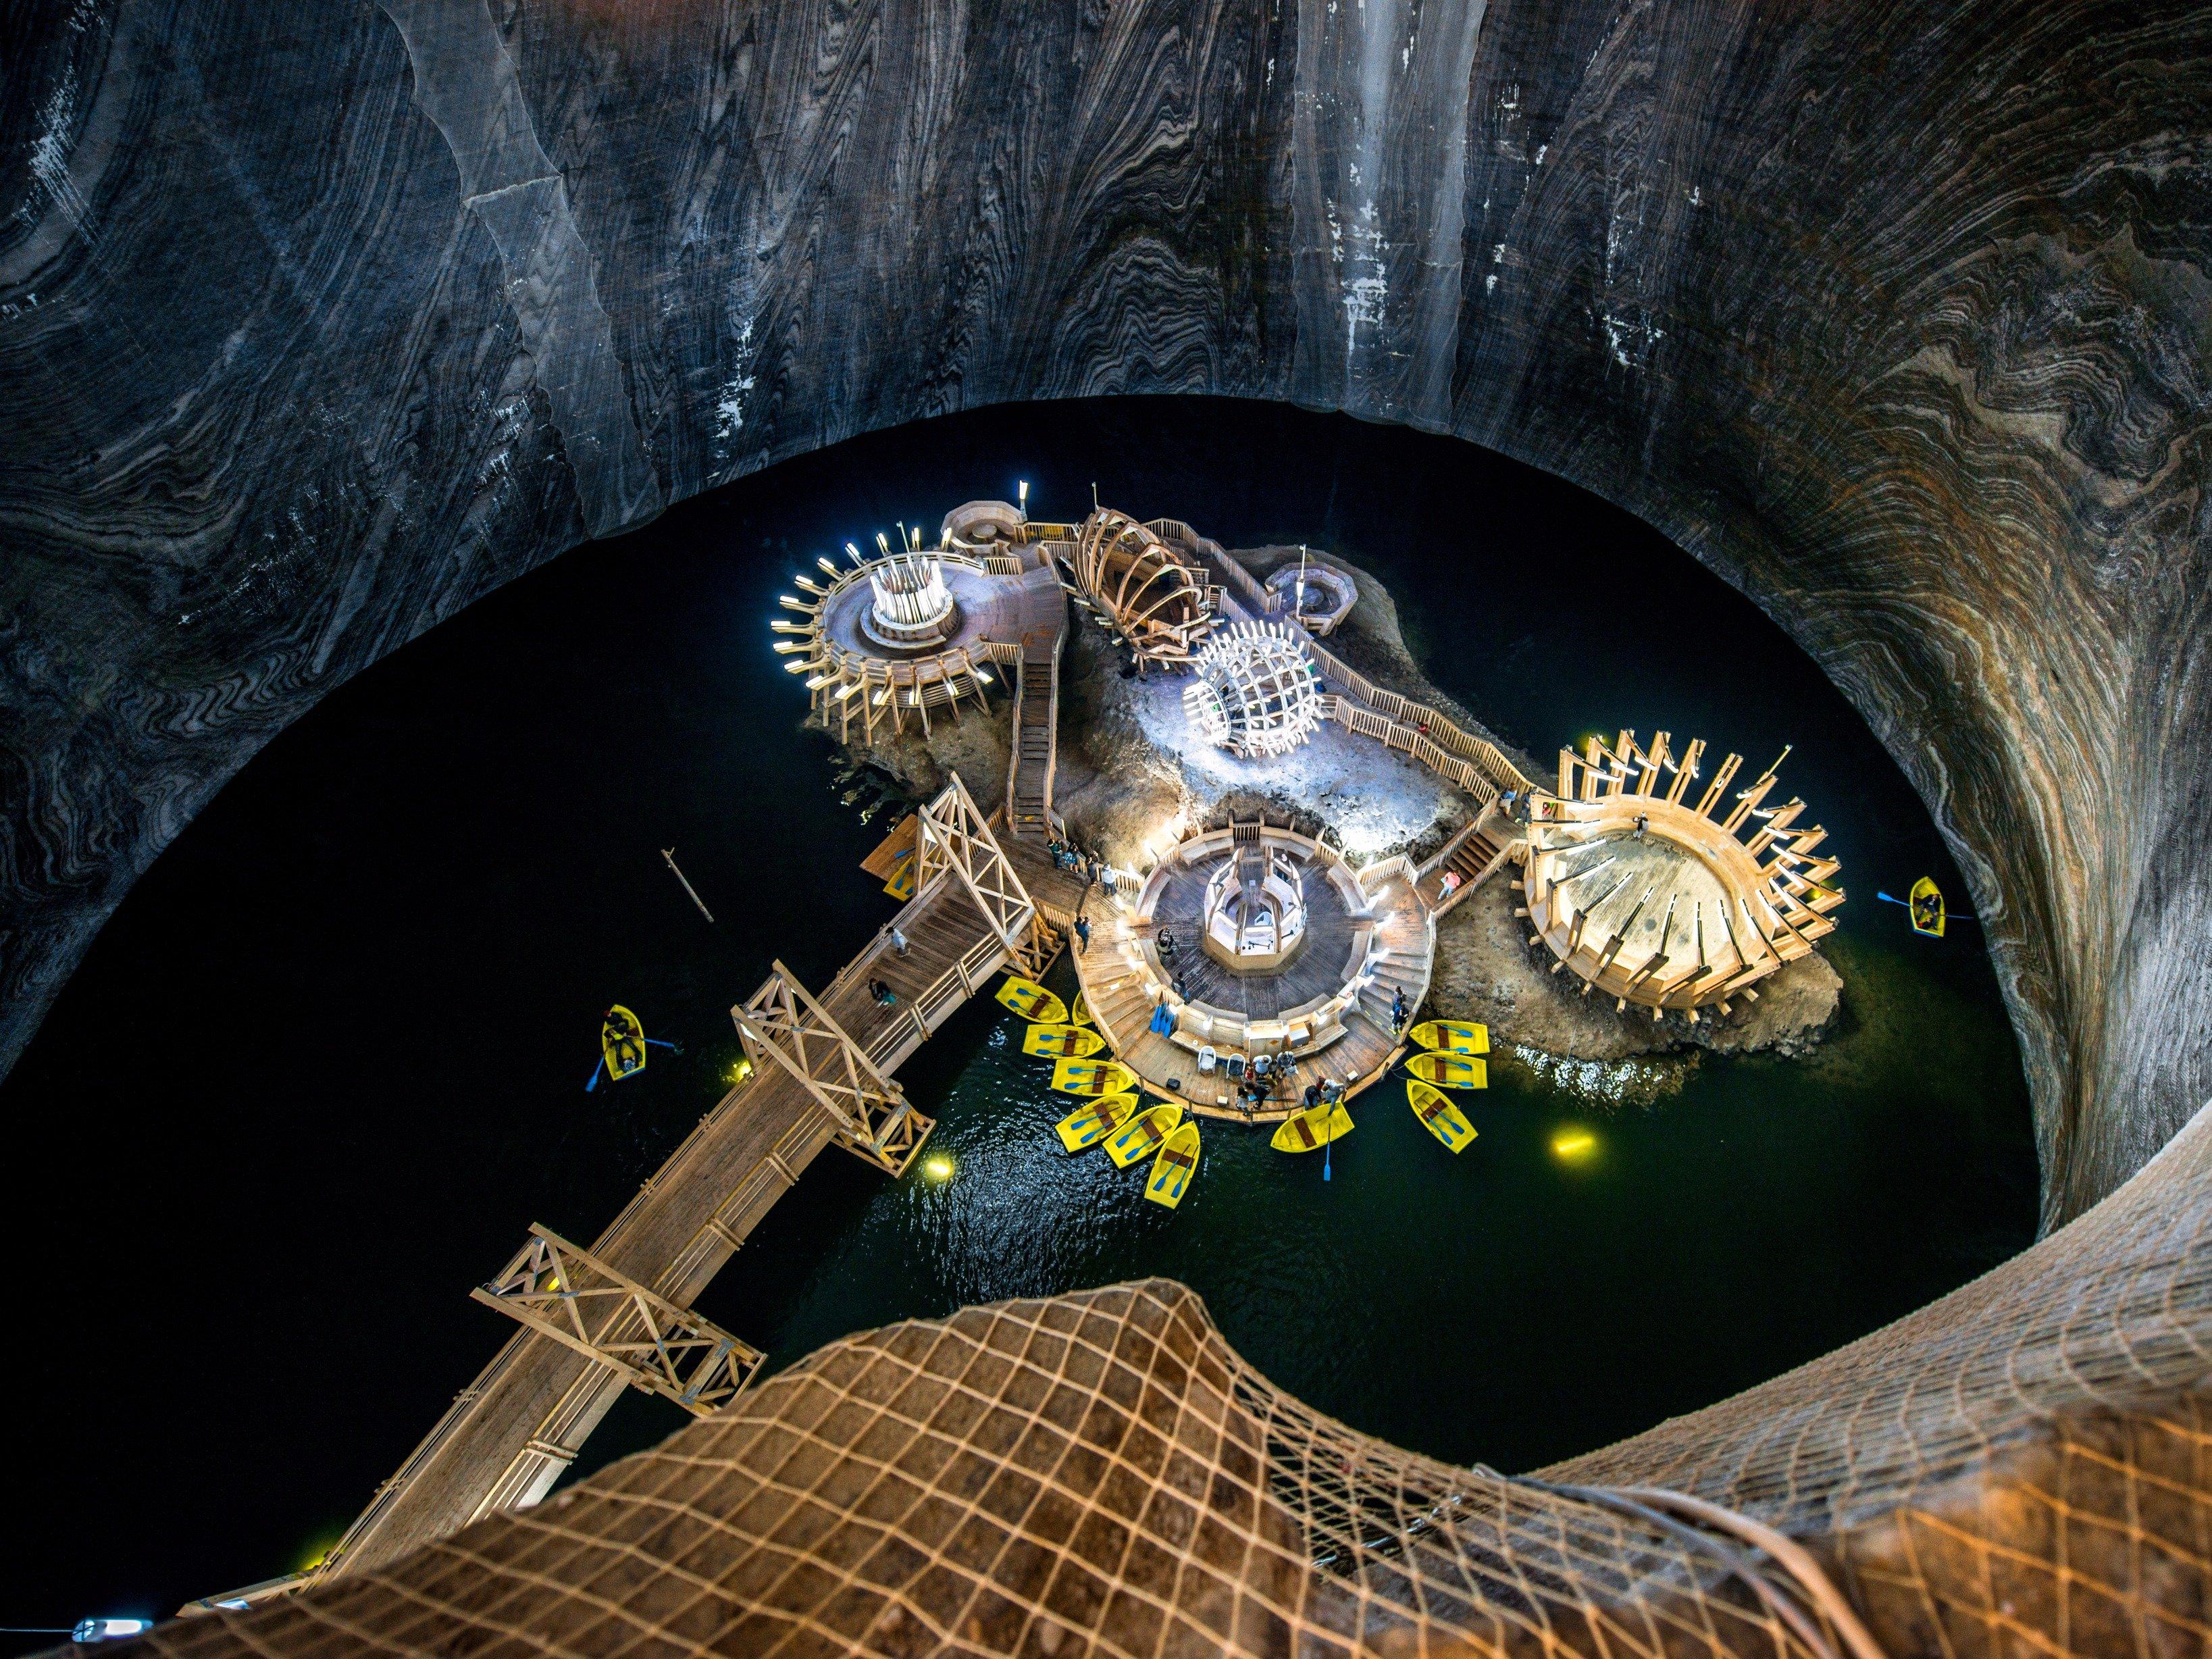 Salina Turda in Romania stunning underground caverns for halotherapy